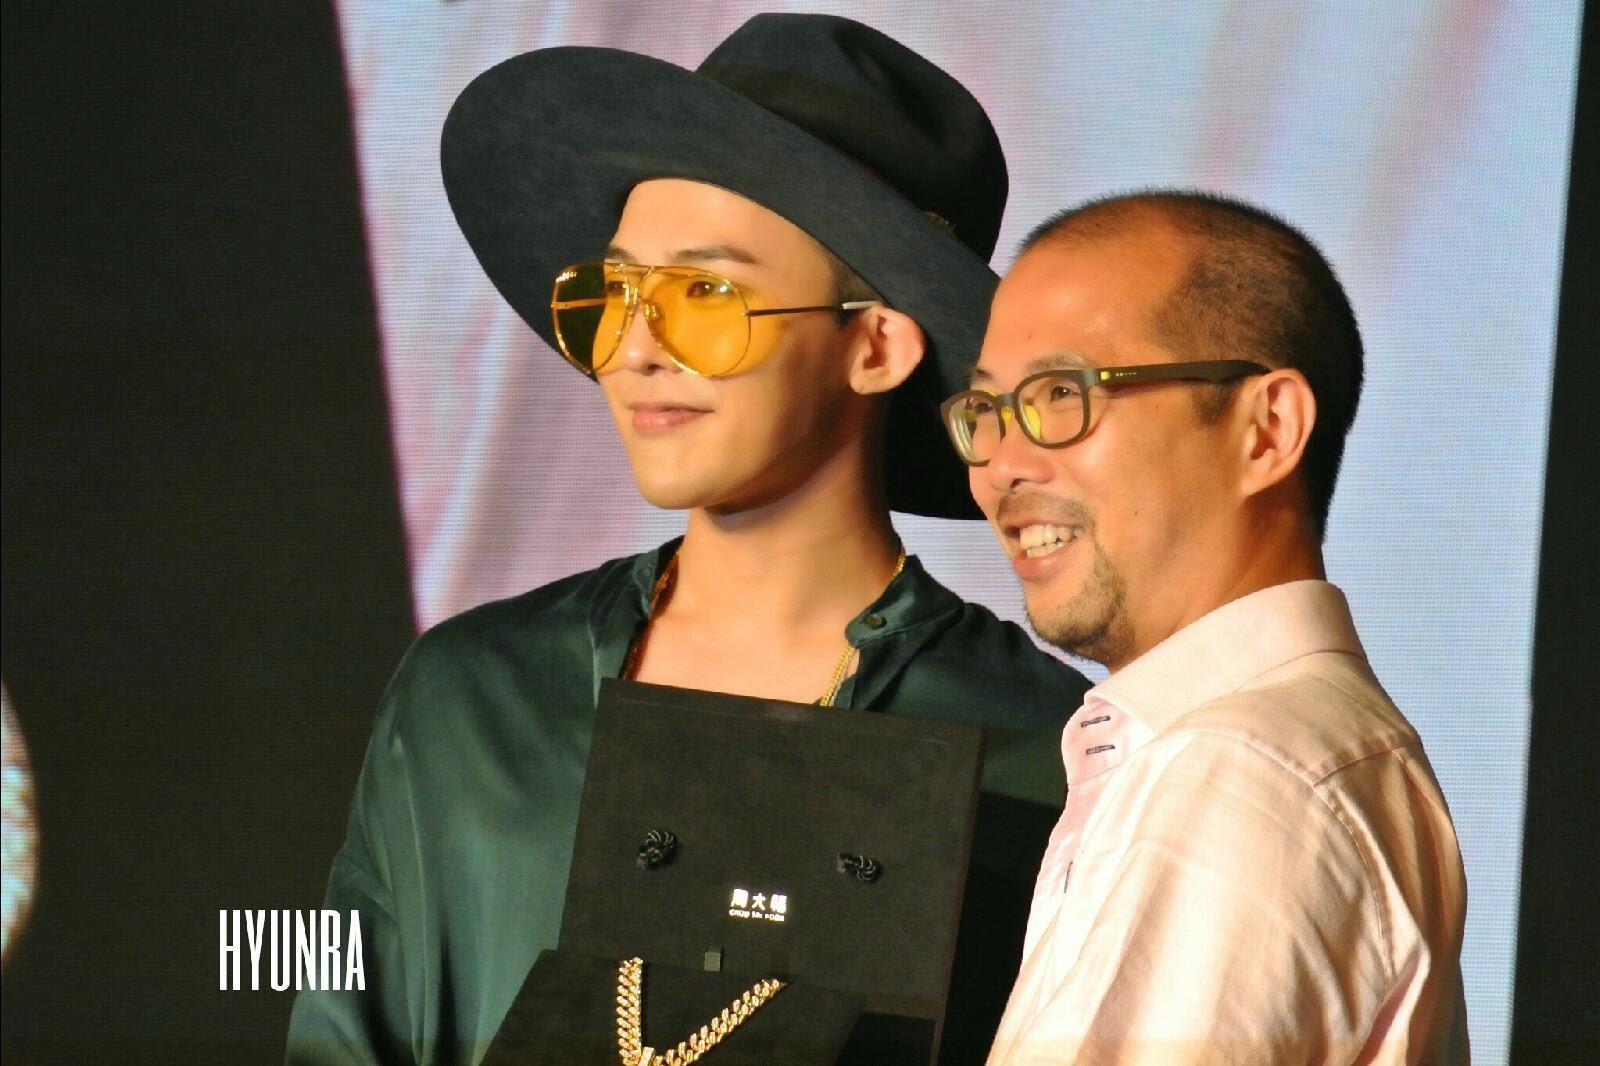 GD-ChowTaiFook-FM-Hongkong_Hyunra_22.jpg